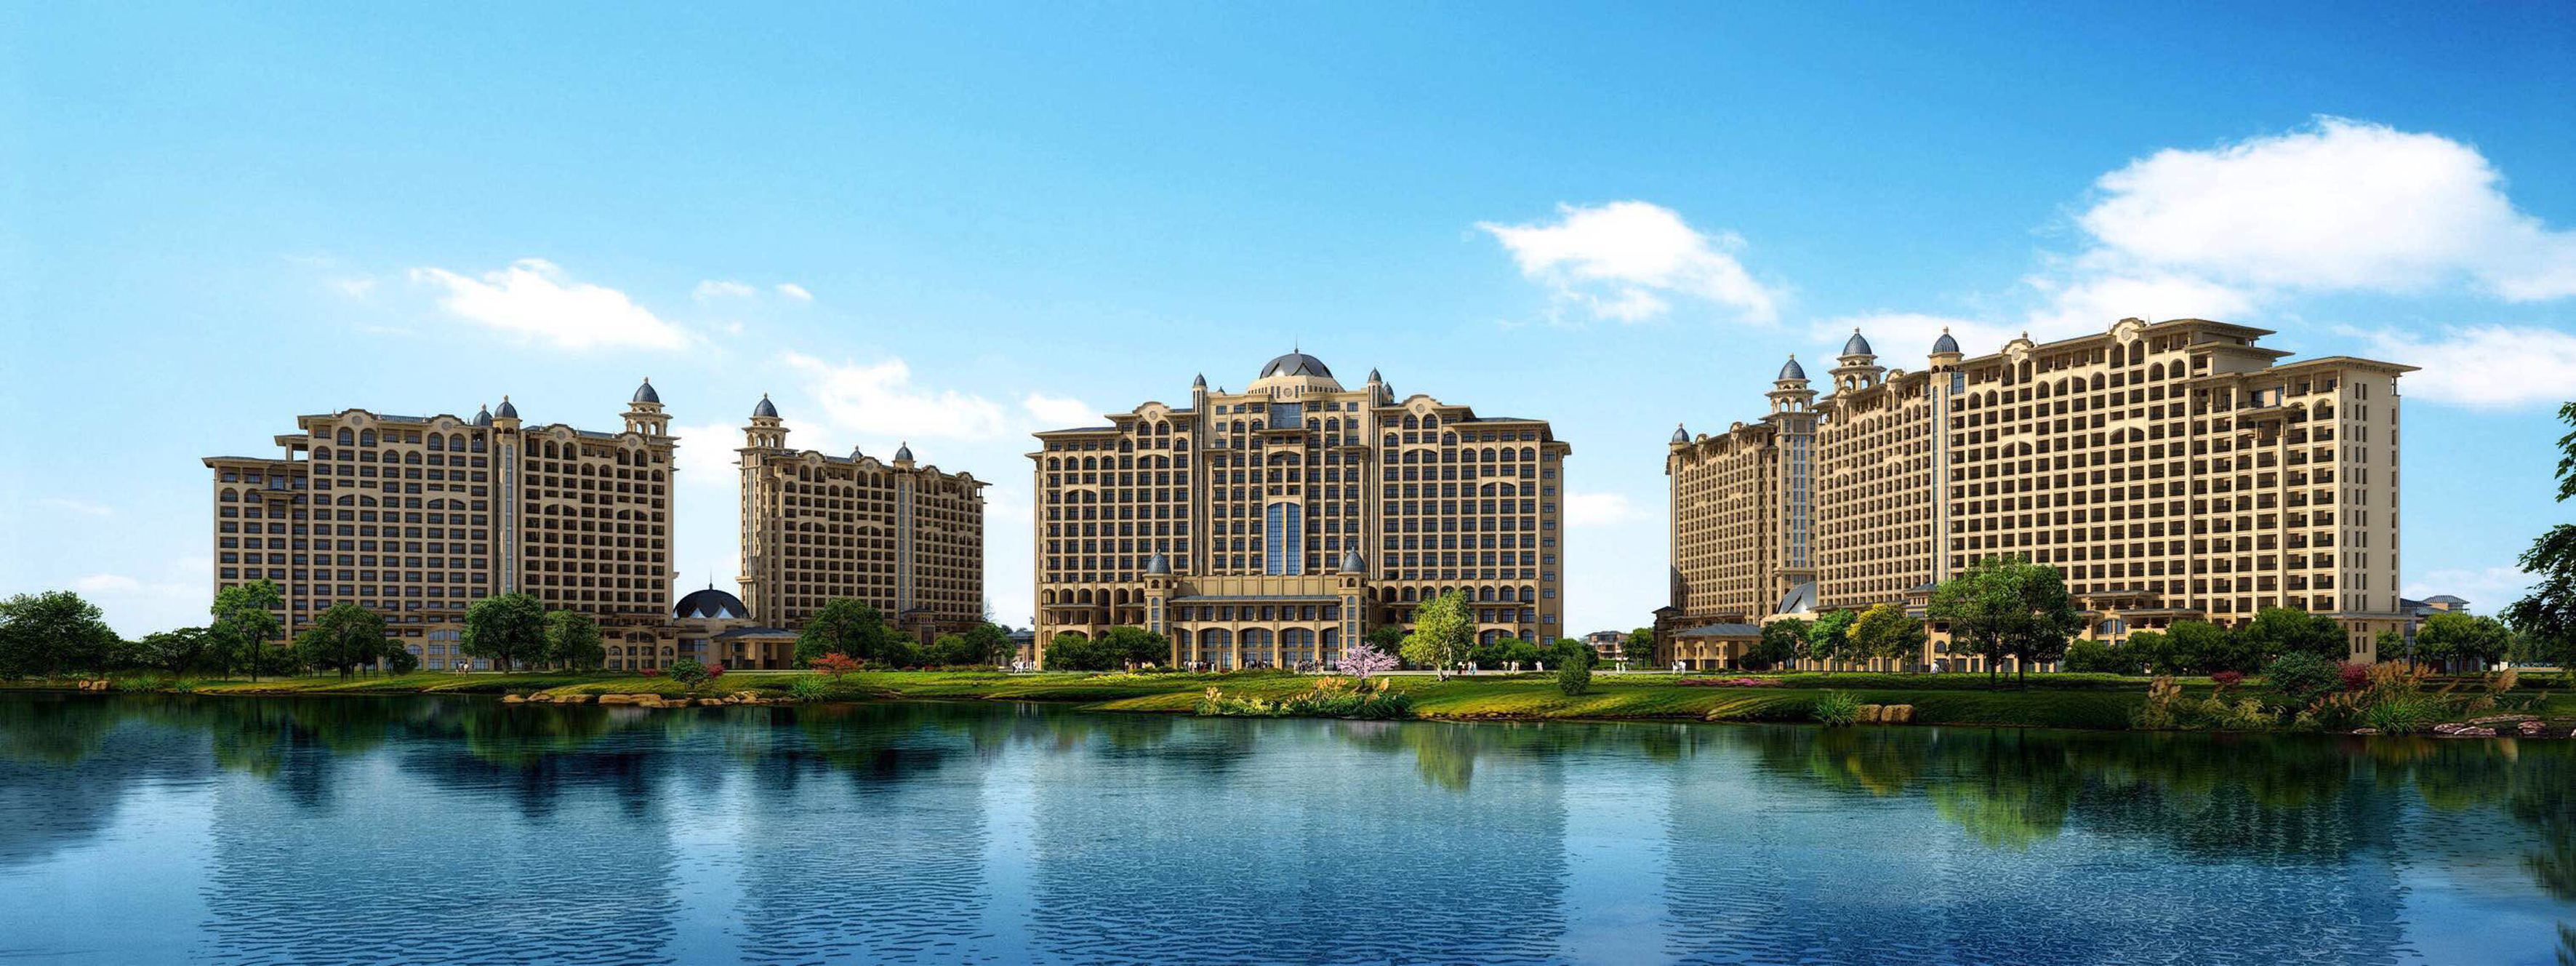 Wyndham Hotel Group Hospitality Net